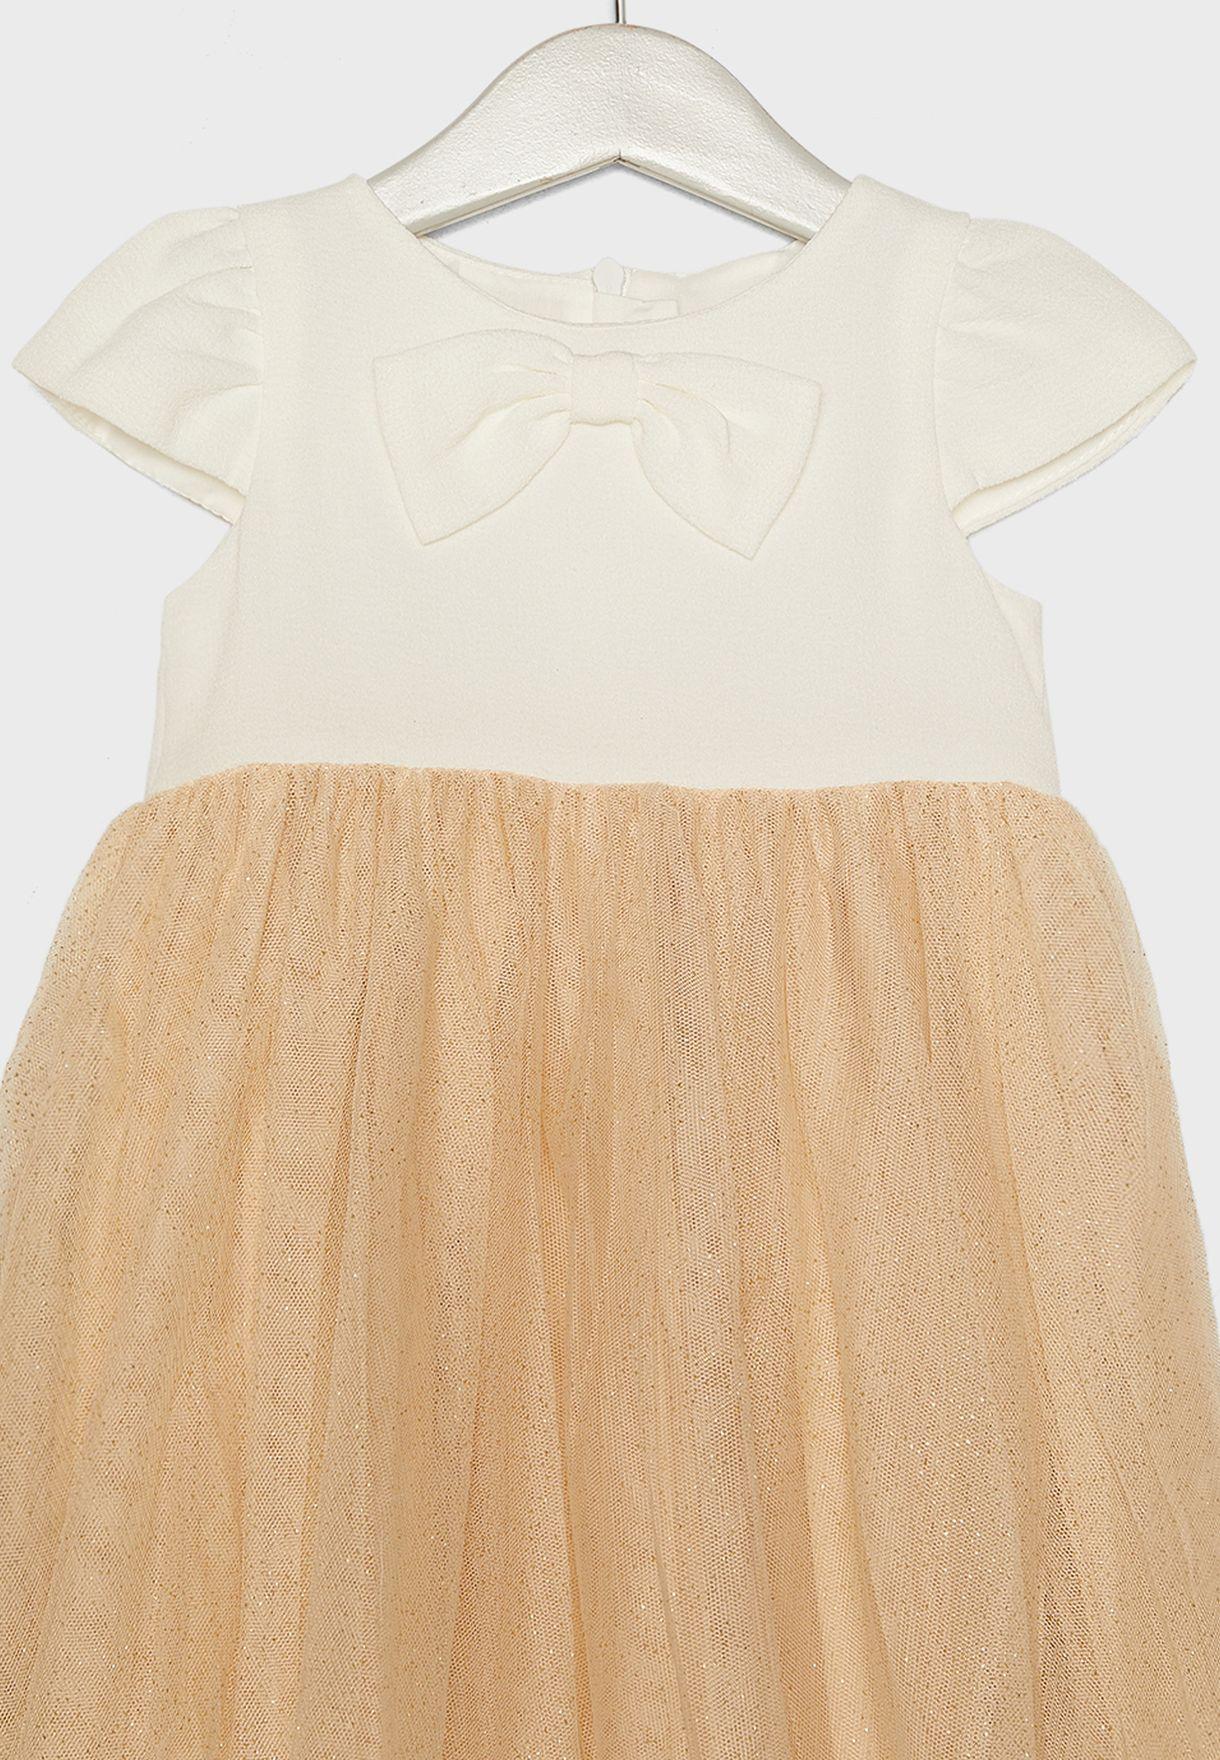 Infant Mesh Dress